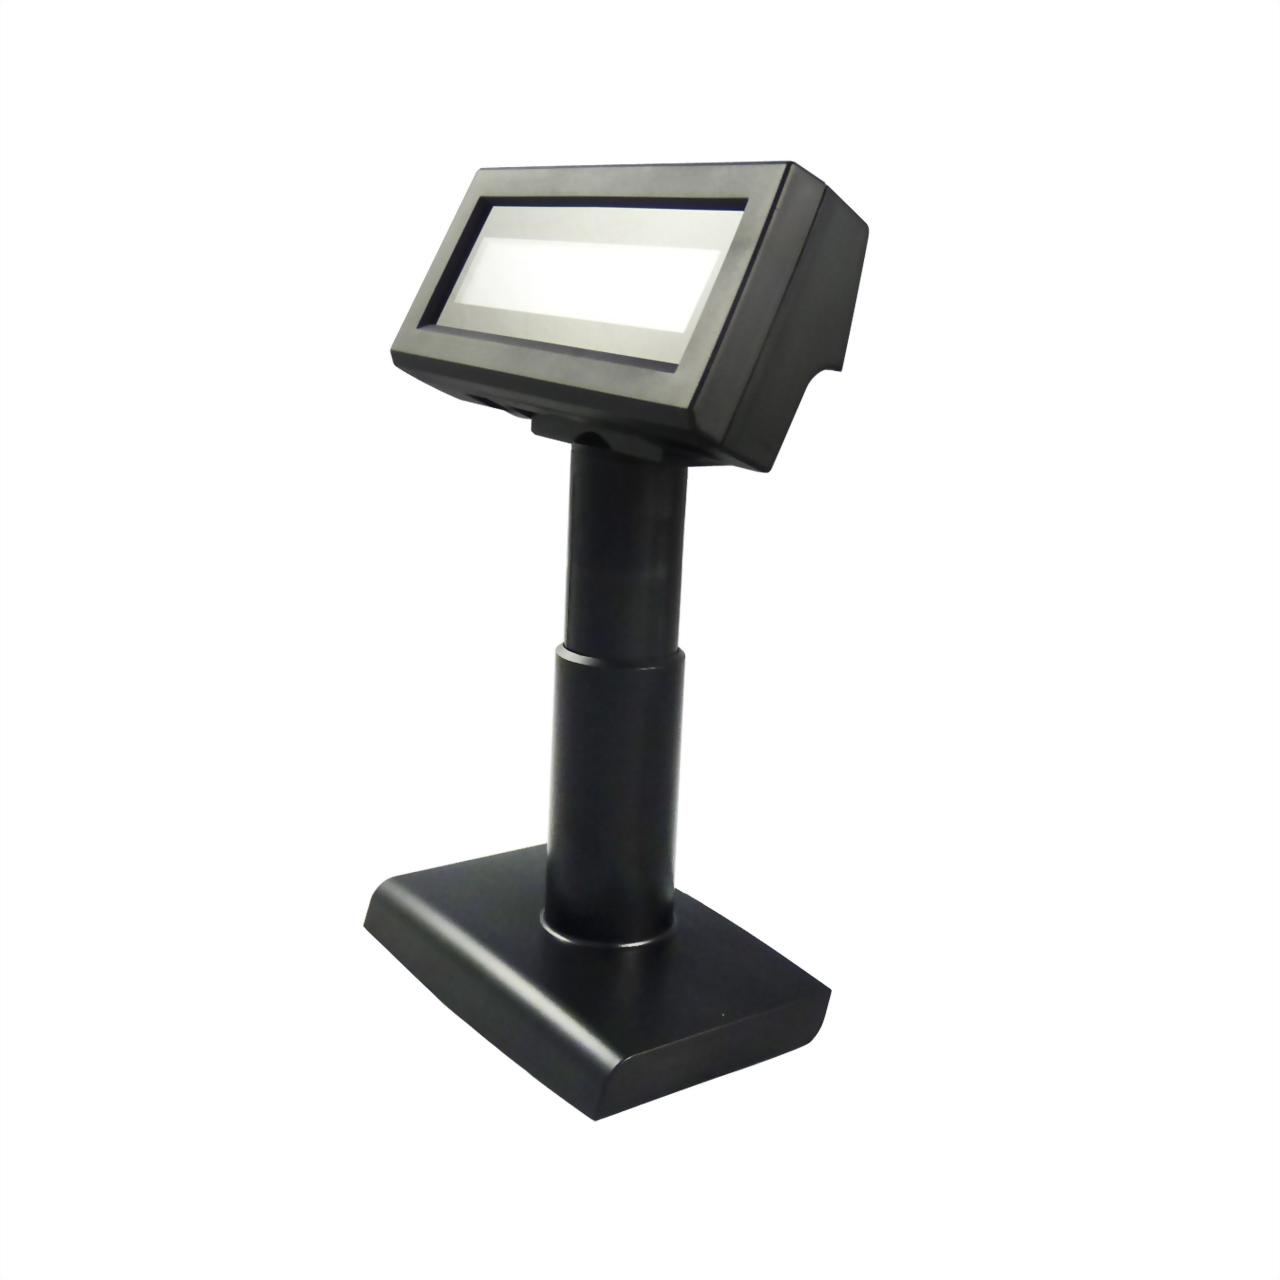 Vacuum Fluorescent Customer Displays VFD-200